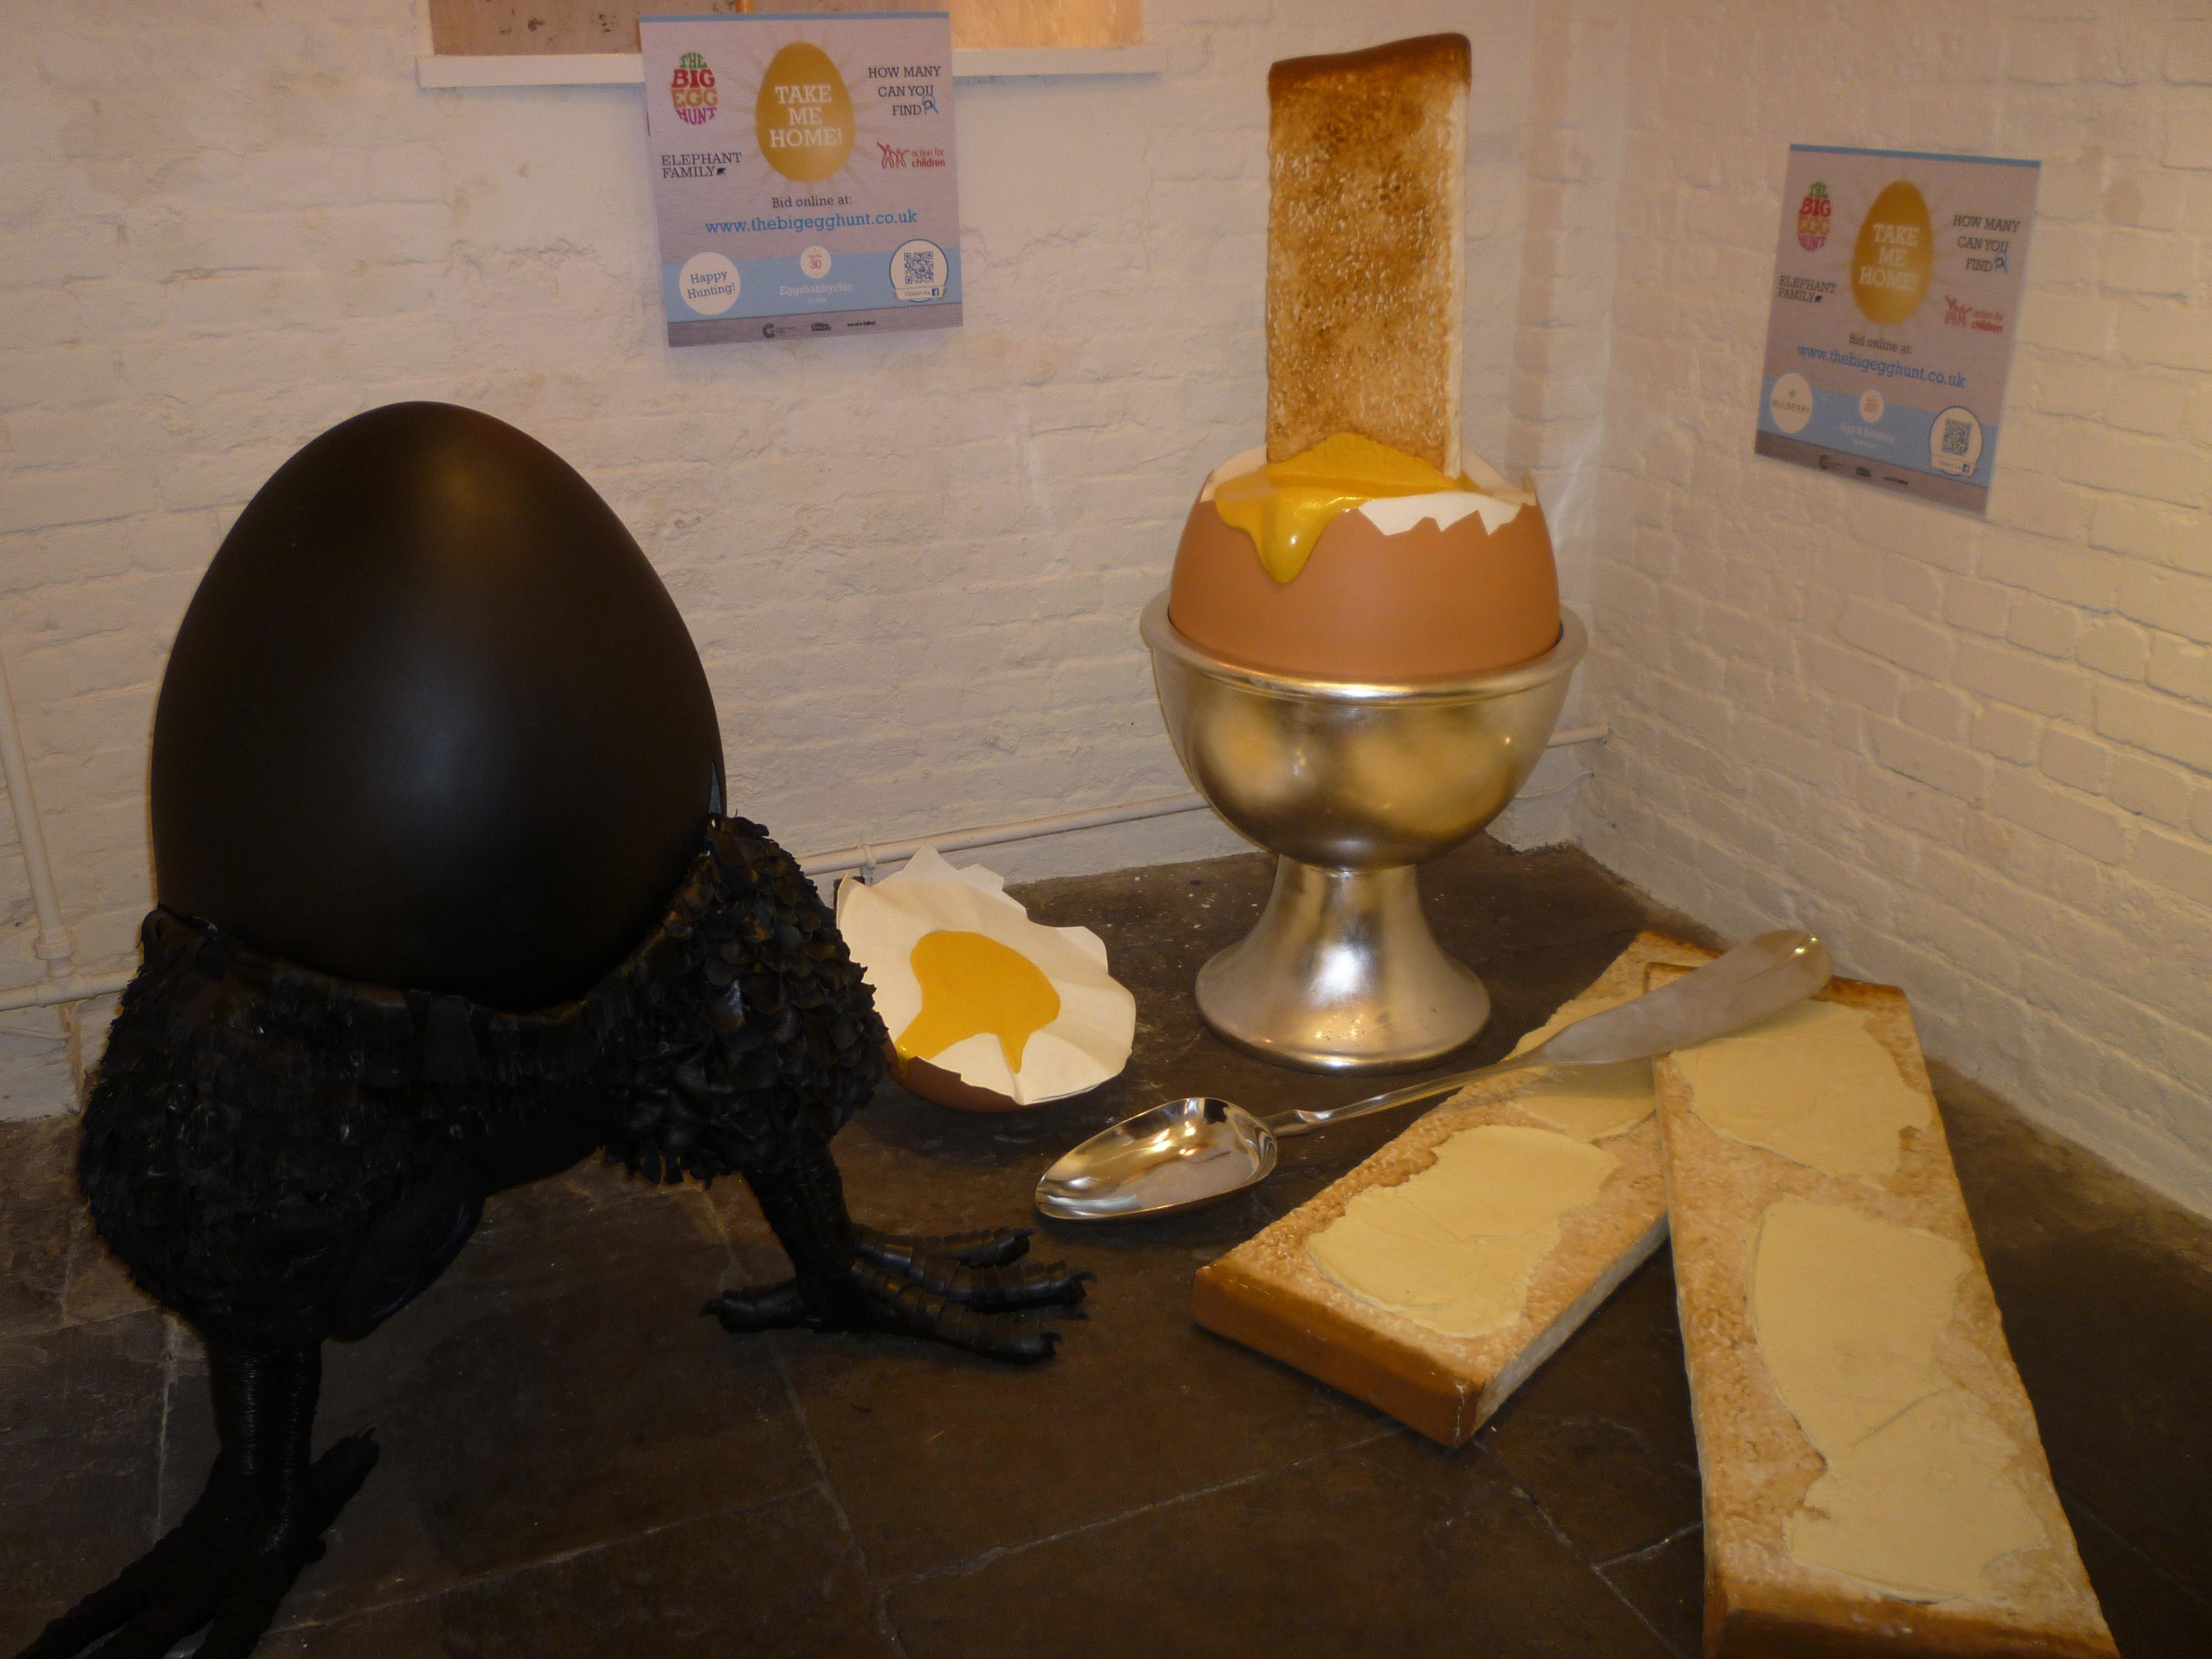 Egg Hunting, Anyone?